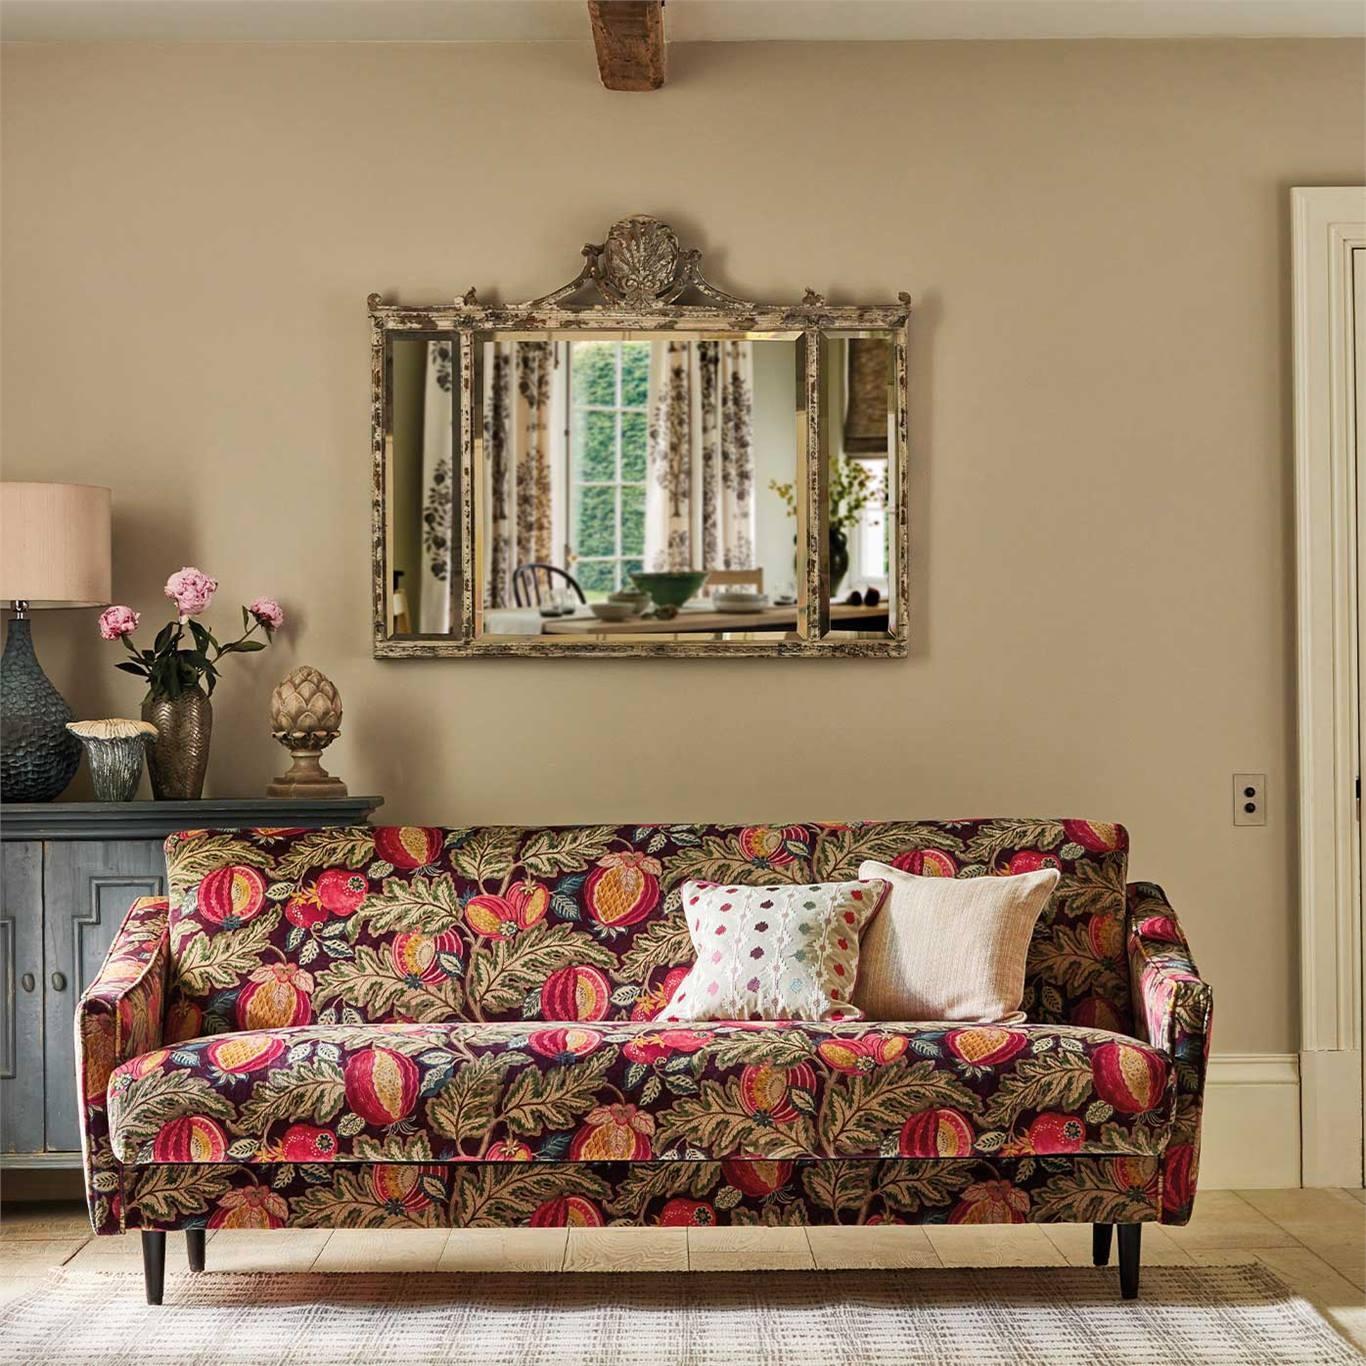 Sanderson Cantaloupe Velvet Cherry/Alabaster Fabric 226635